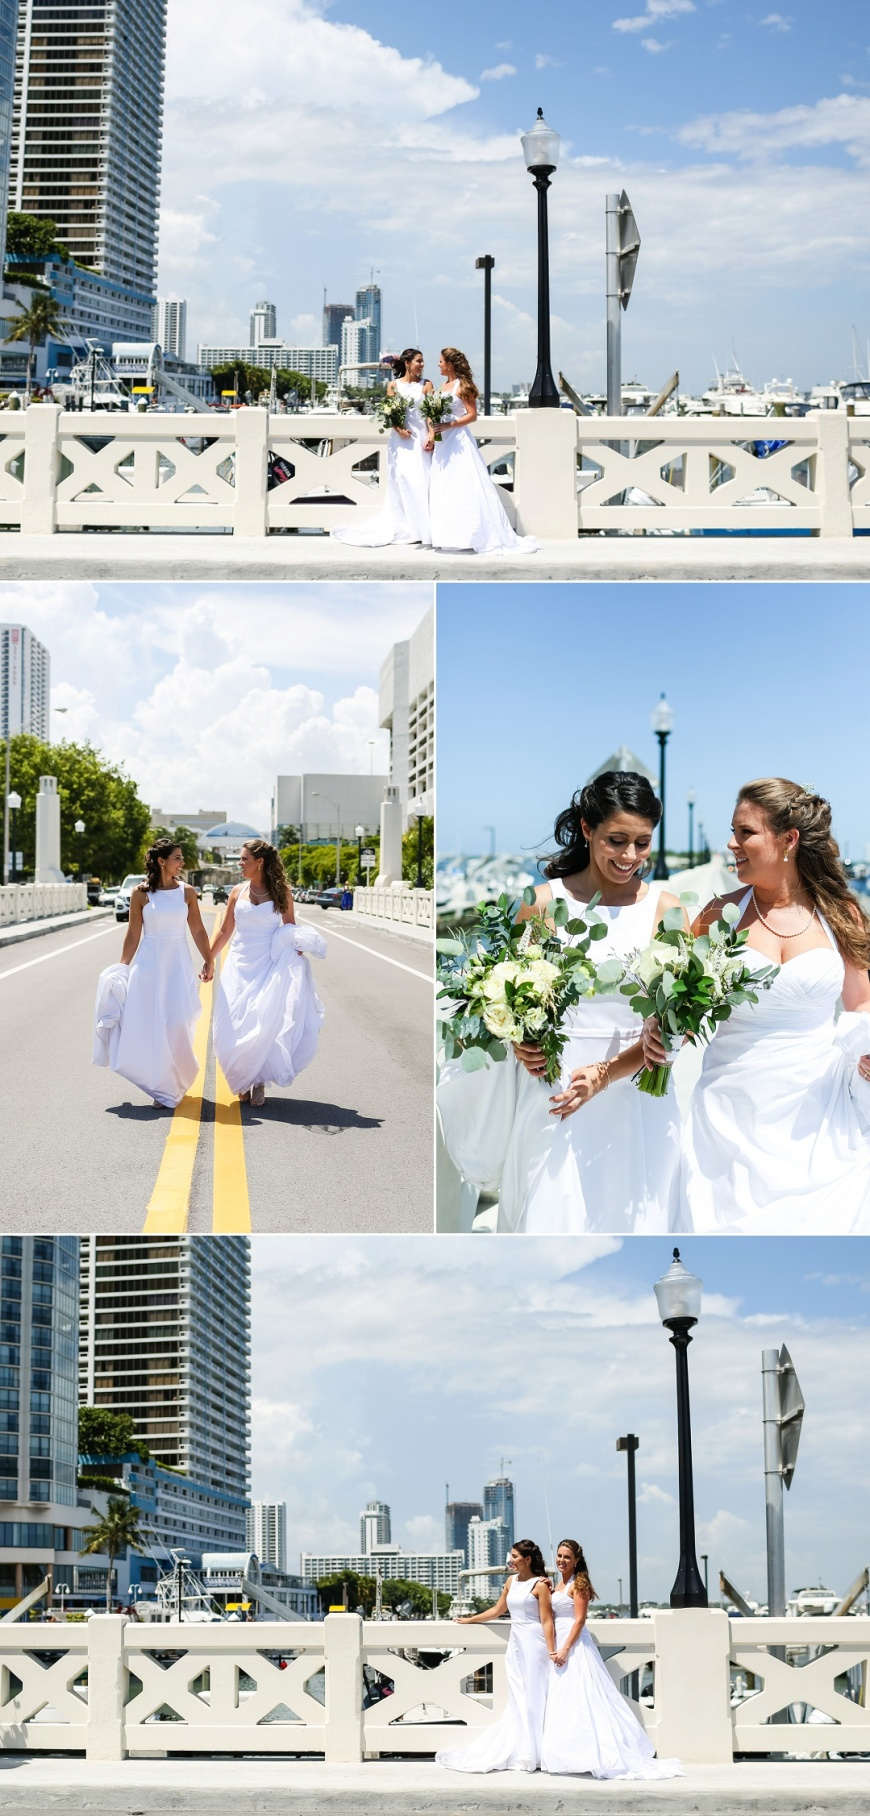 Royal-Palm-Island-Miami-Wedding-Photographer_1033.jpg